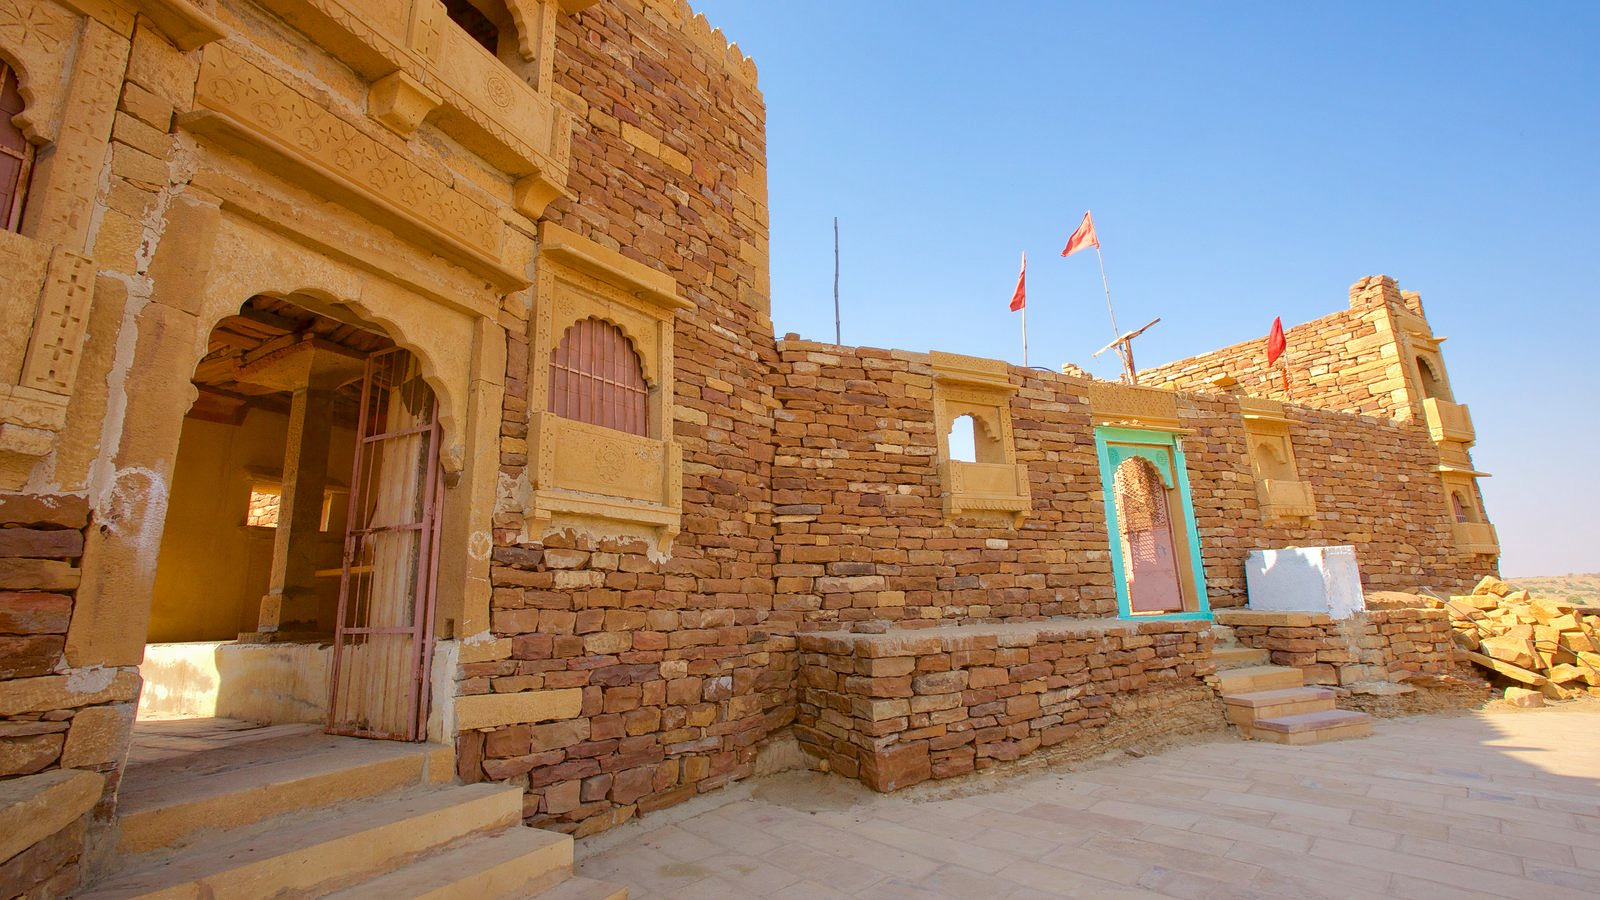 1510323529_97489-jaisalmer-and-vicinity.jpg